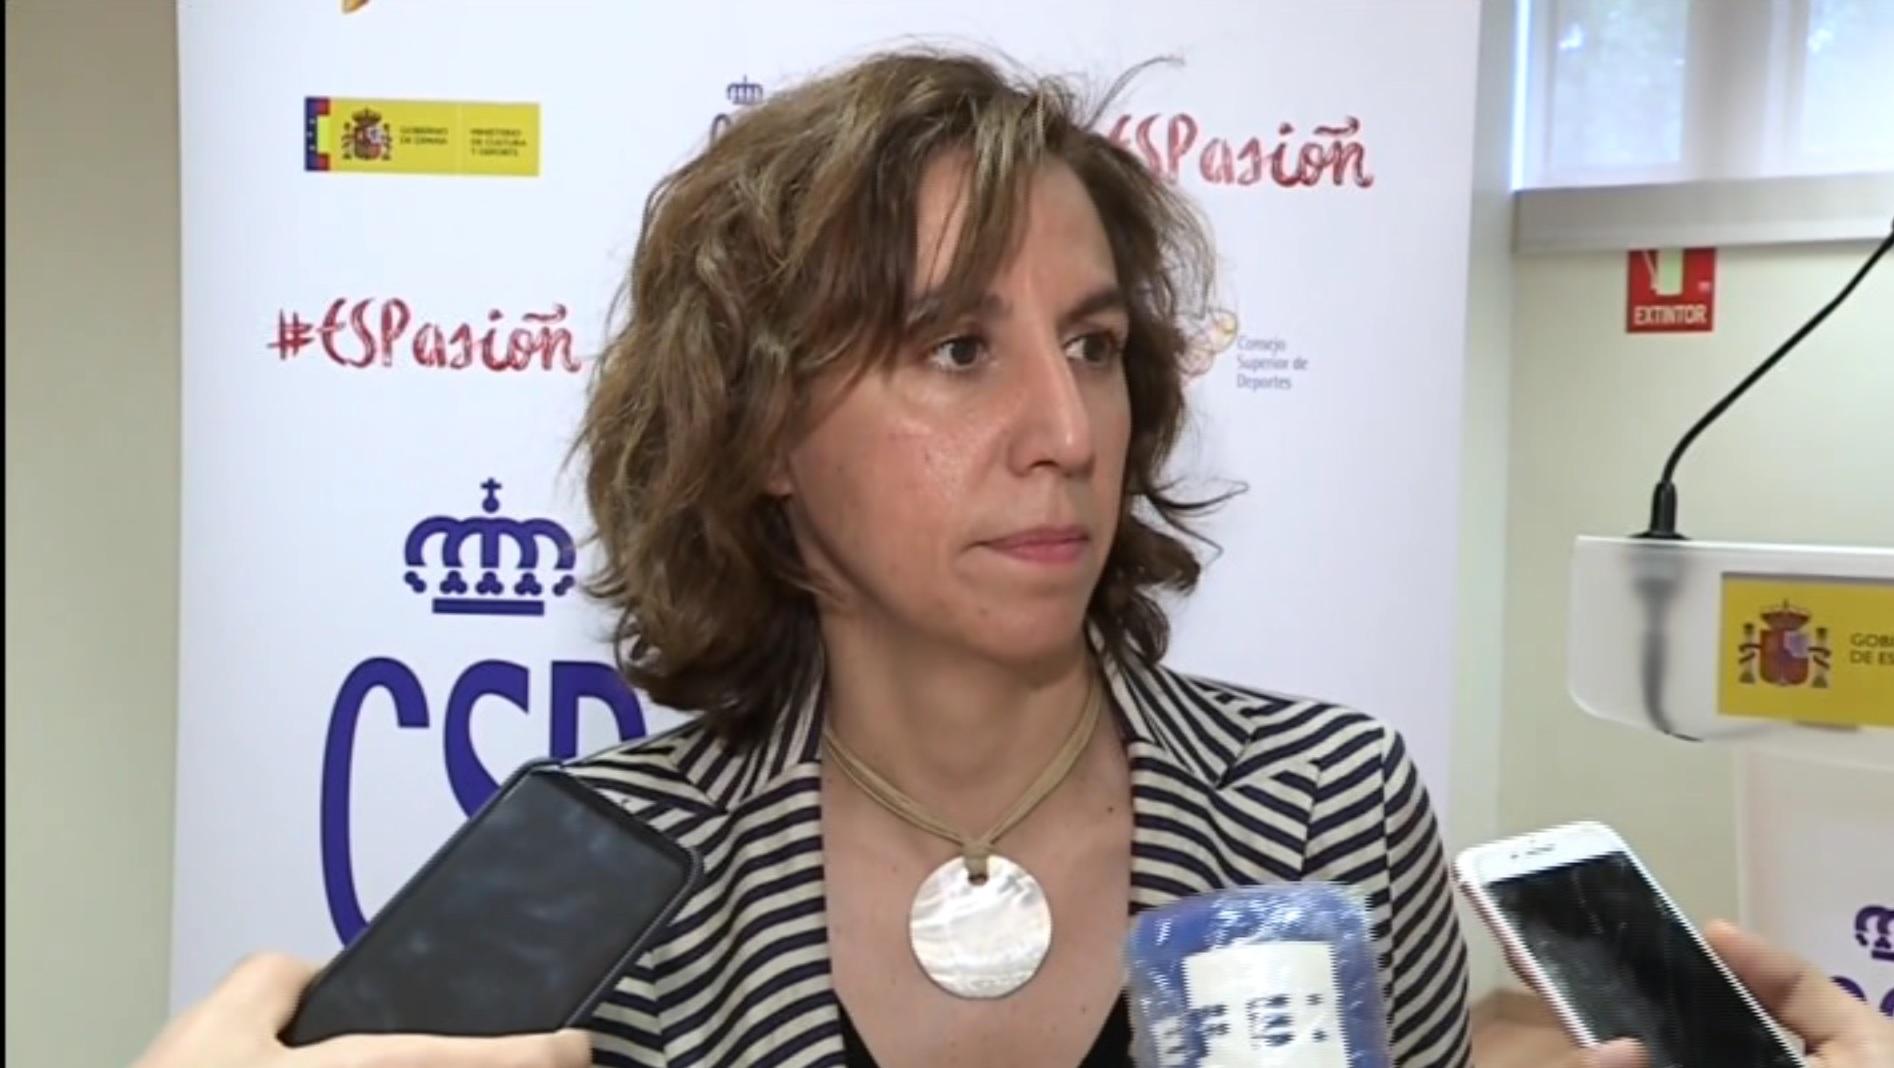 Irene+Lozano+haur%C3%A0+de+compar%C3%A8ixer+en+la+reclamaci%C3%B3+del+Lleida